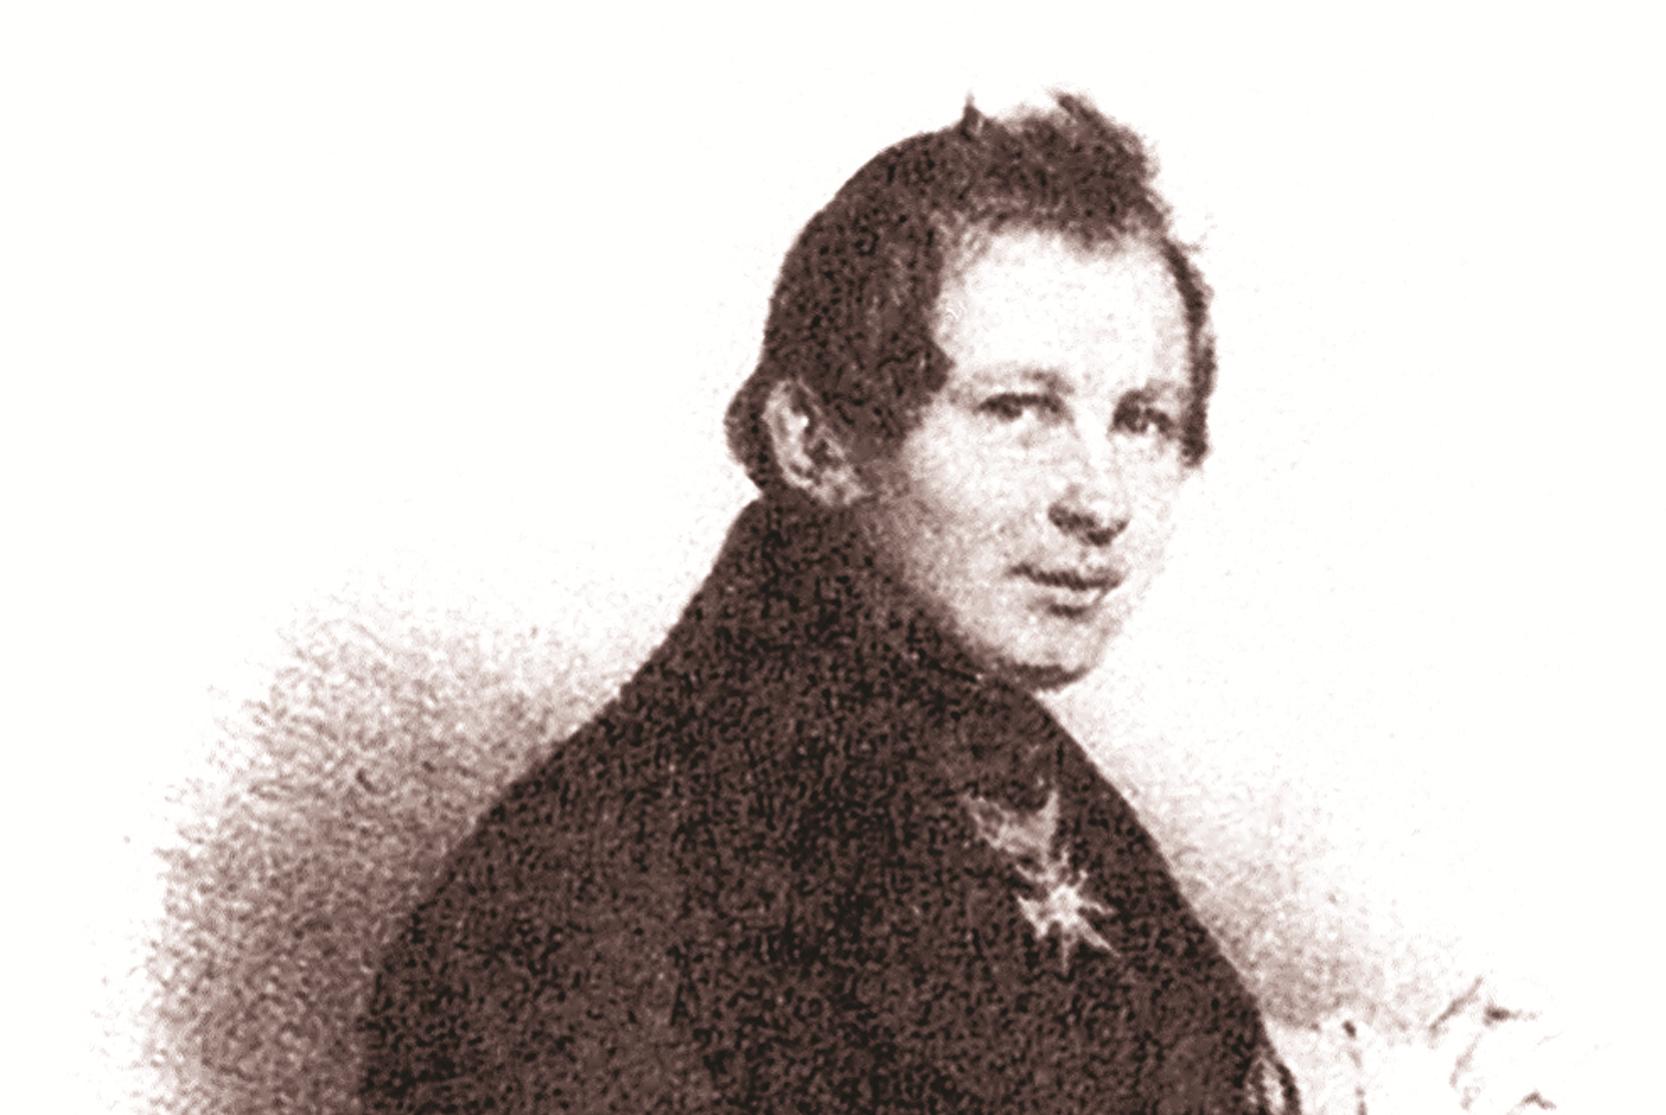 Федор Григорьевич Солнцев-портретист